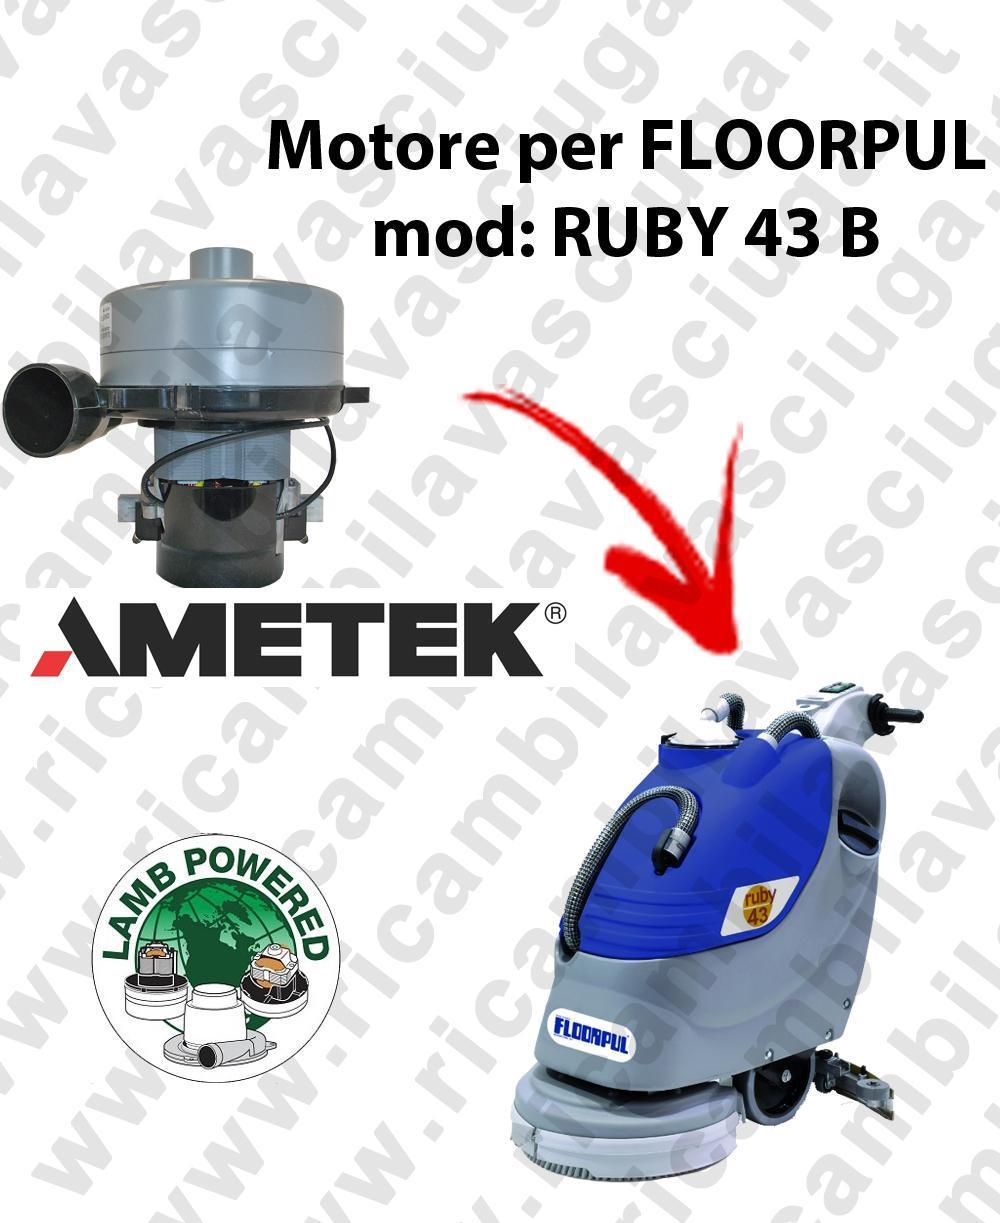 RUBY 43 B Saugmotor LAMB AMETEK für scheuersaugmaschinen FLOORPUL